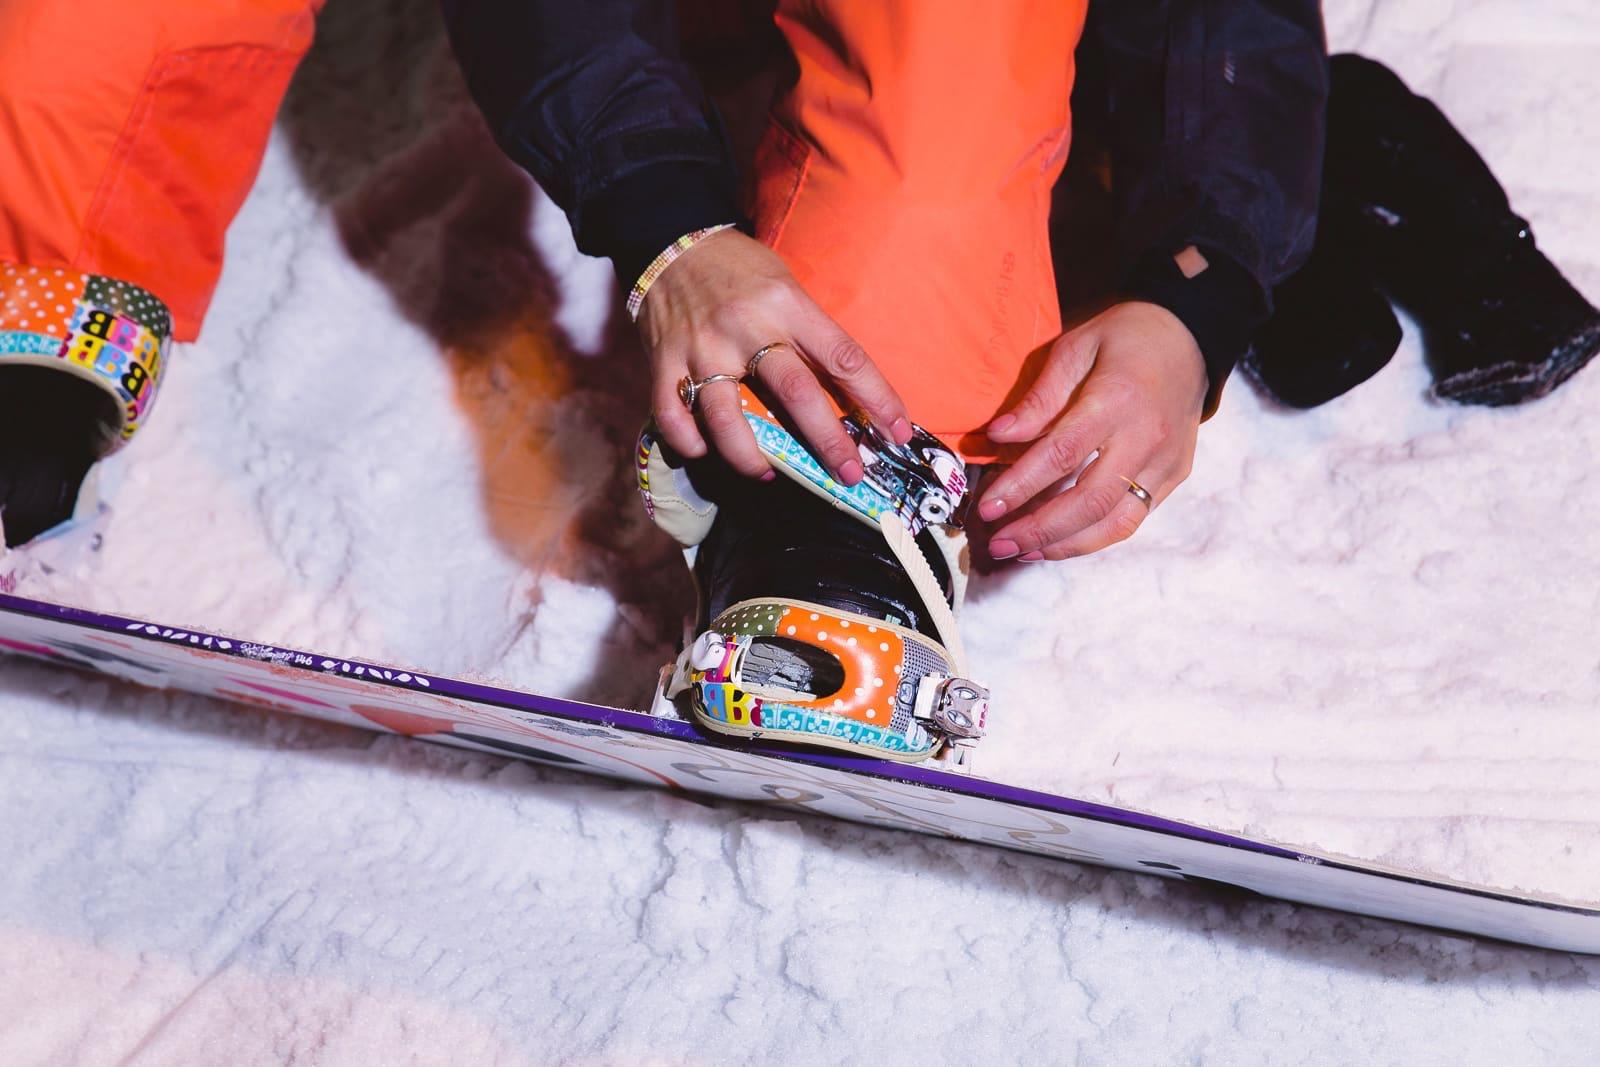 steeffleur_GL2T-SNOW_004